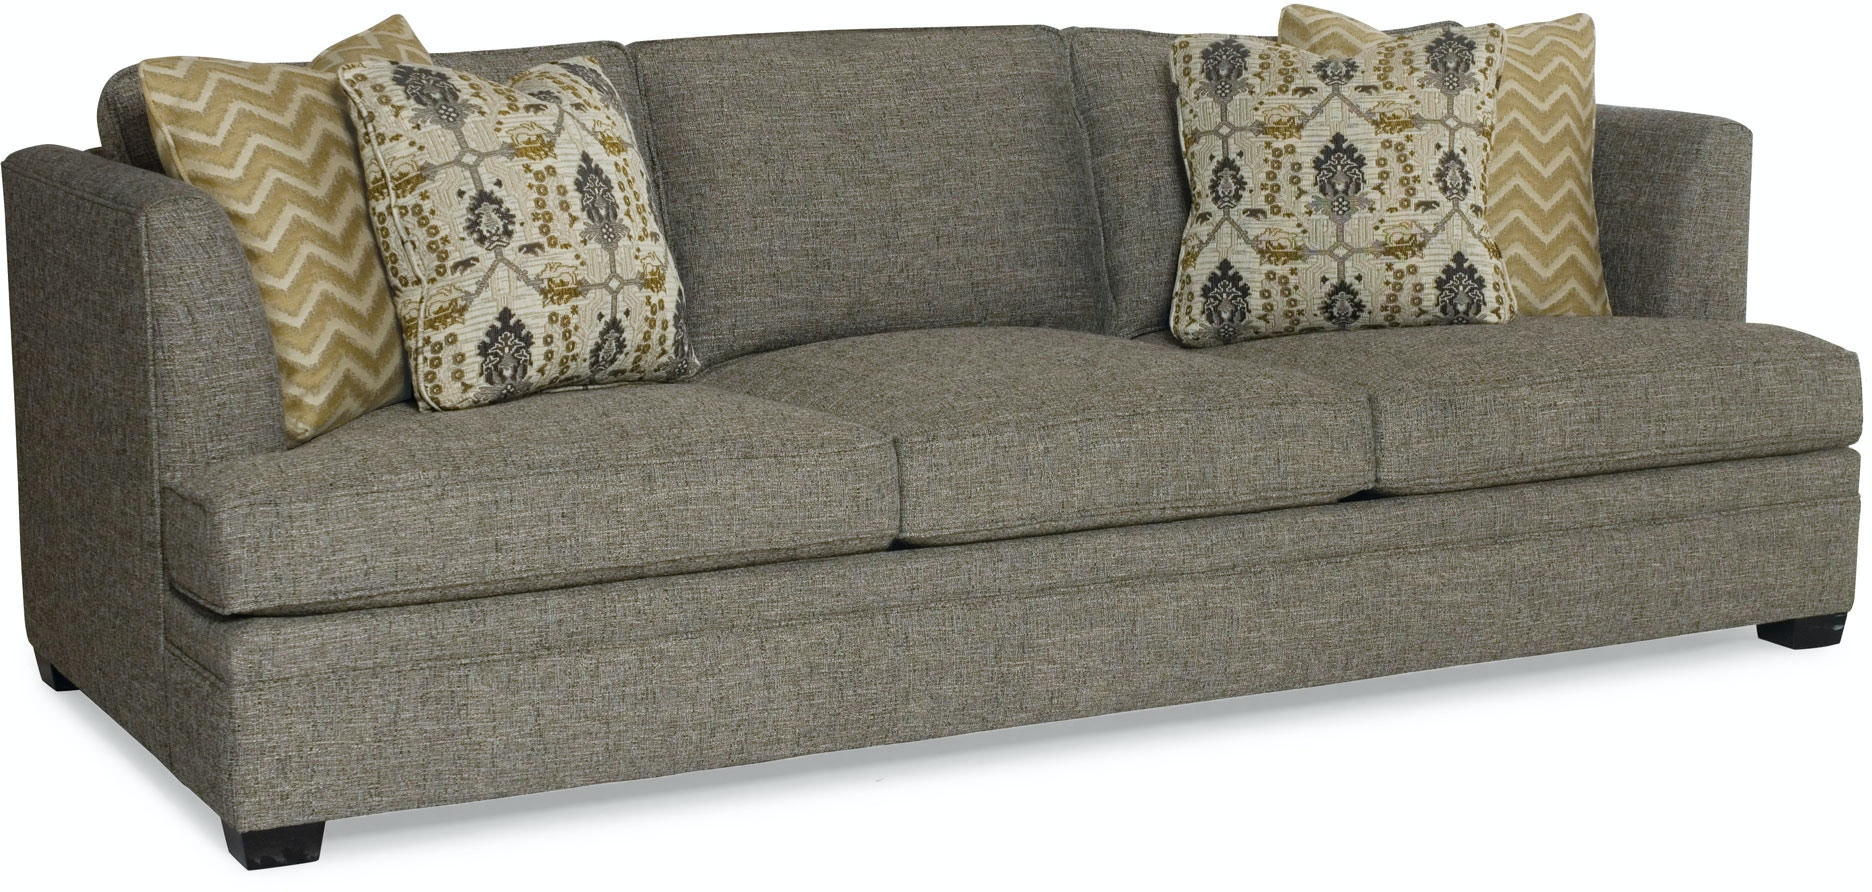 Bernhardt Furniture B1067 Living Room Conway Sofa